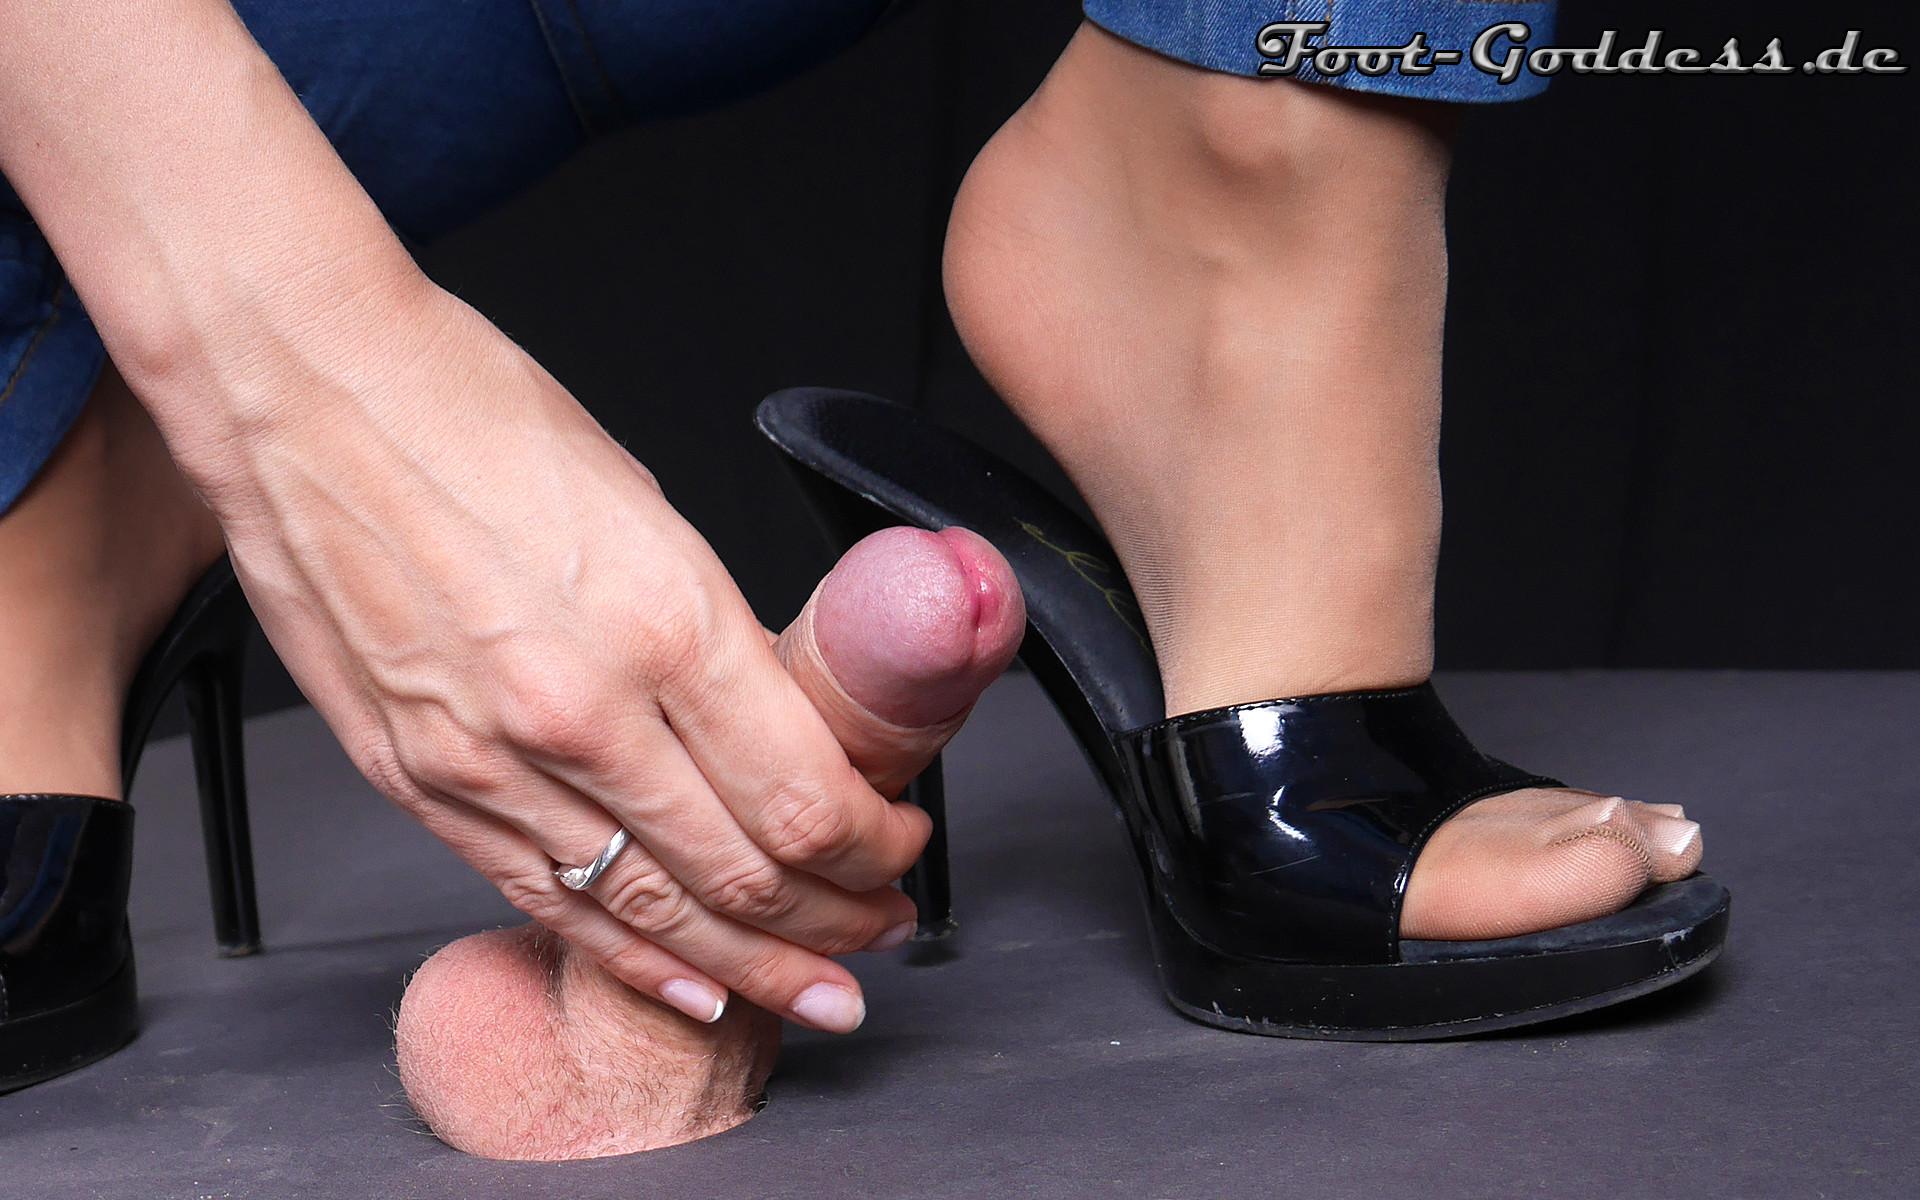 foot-goddess-1-24